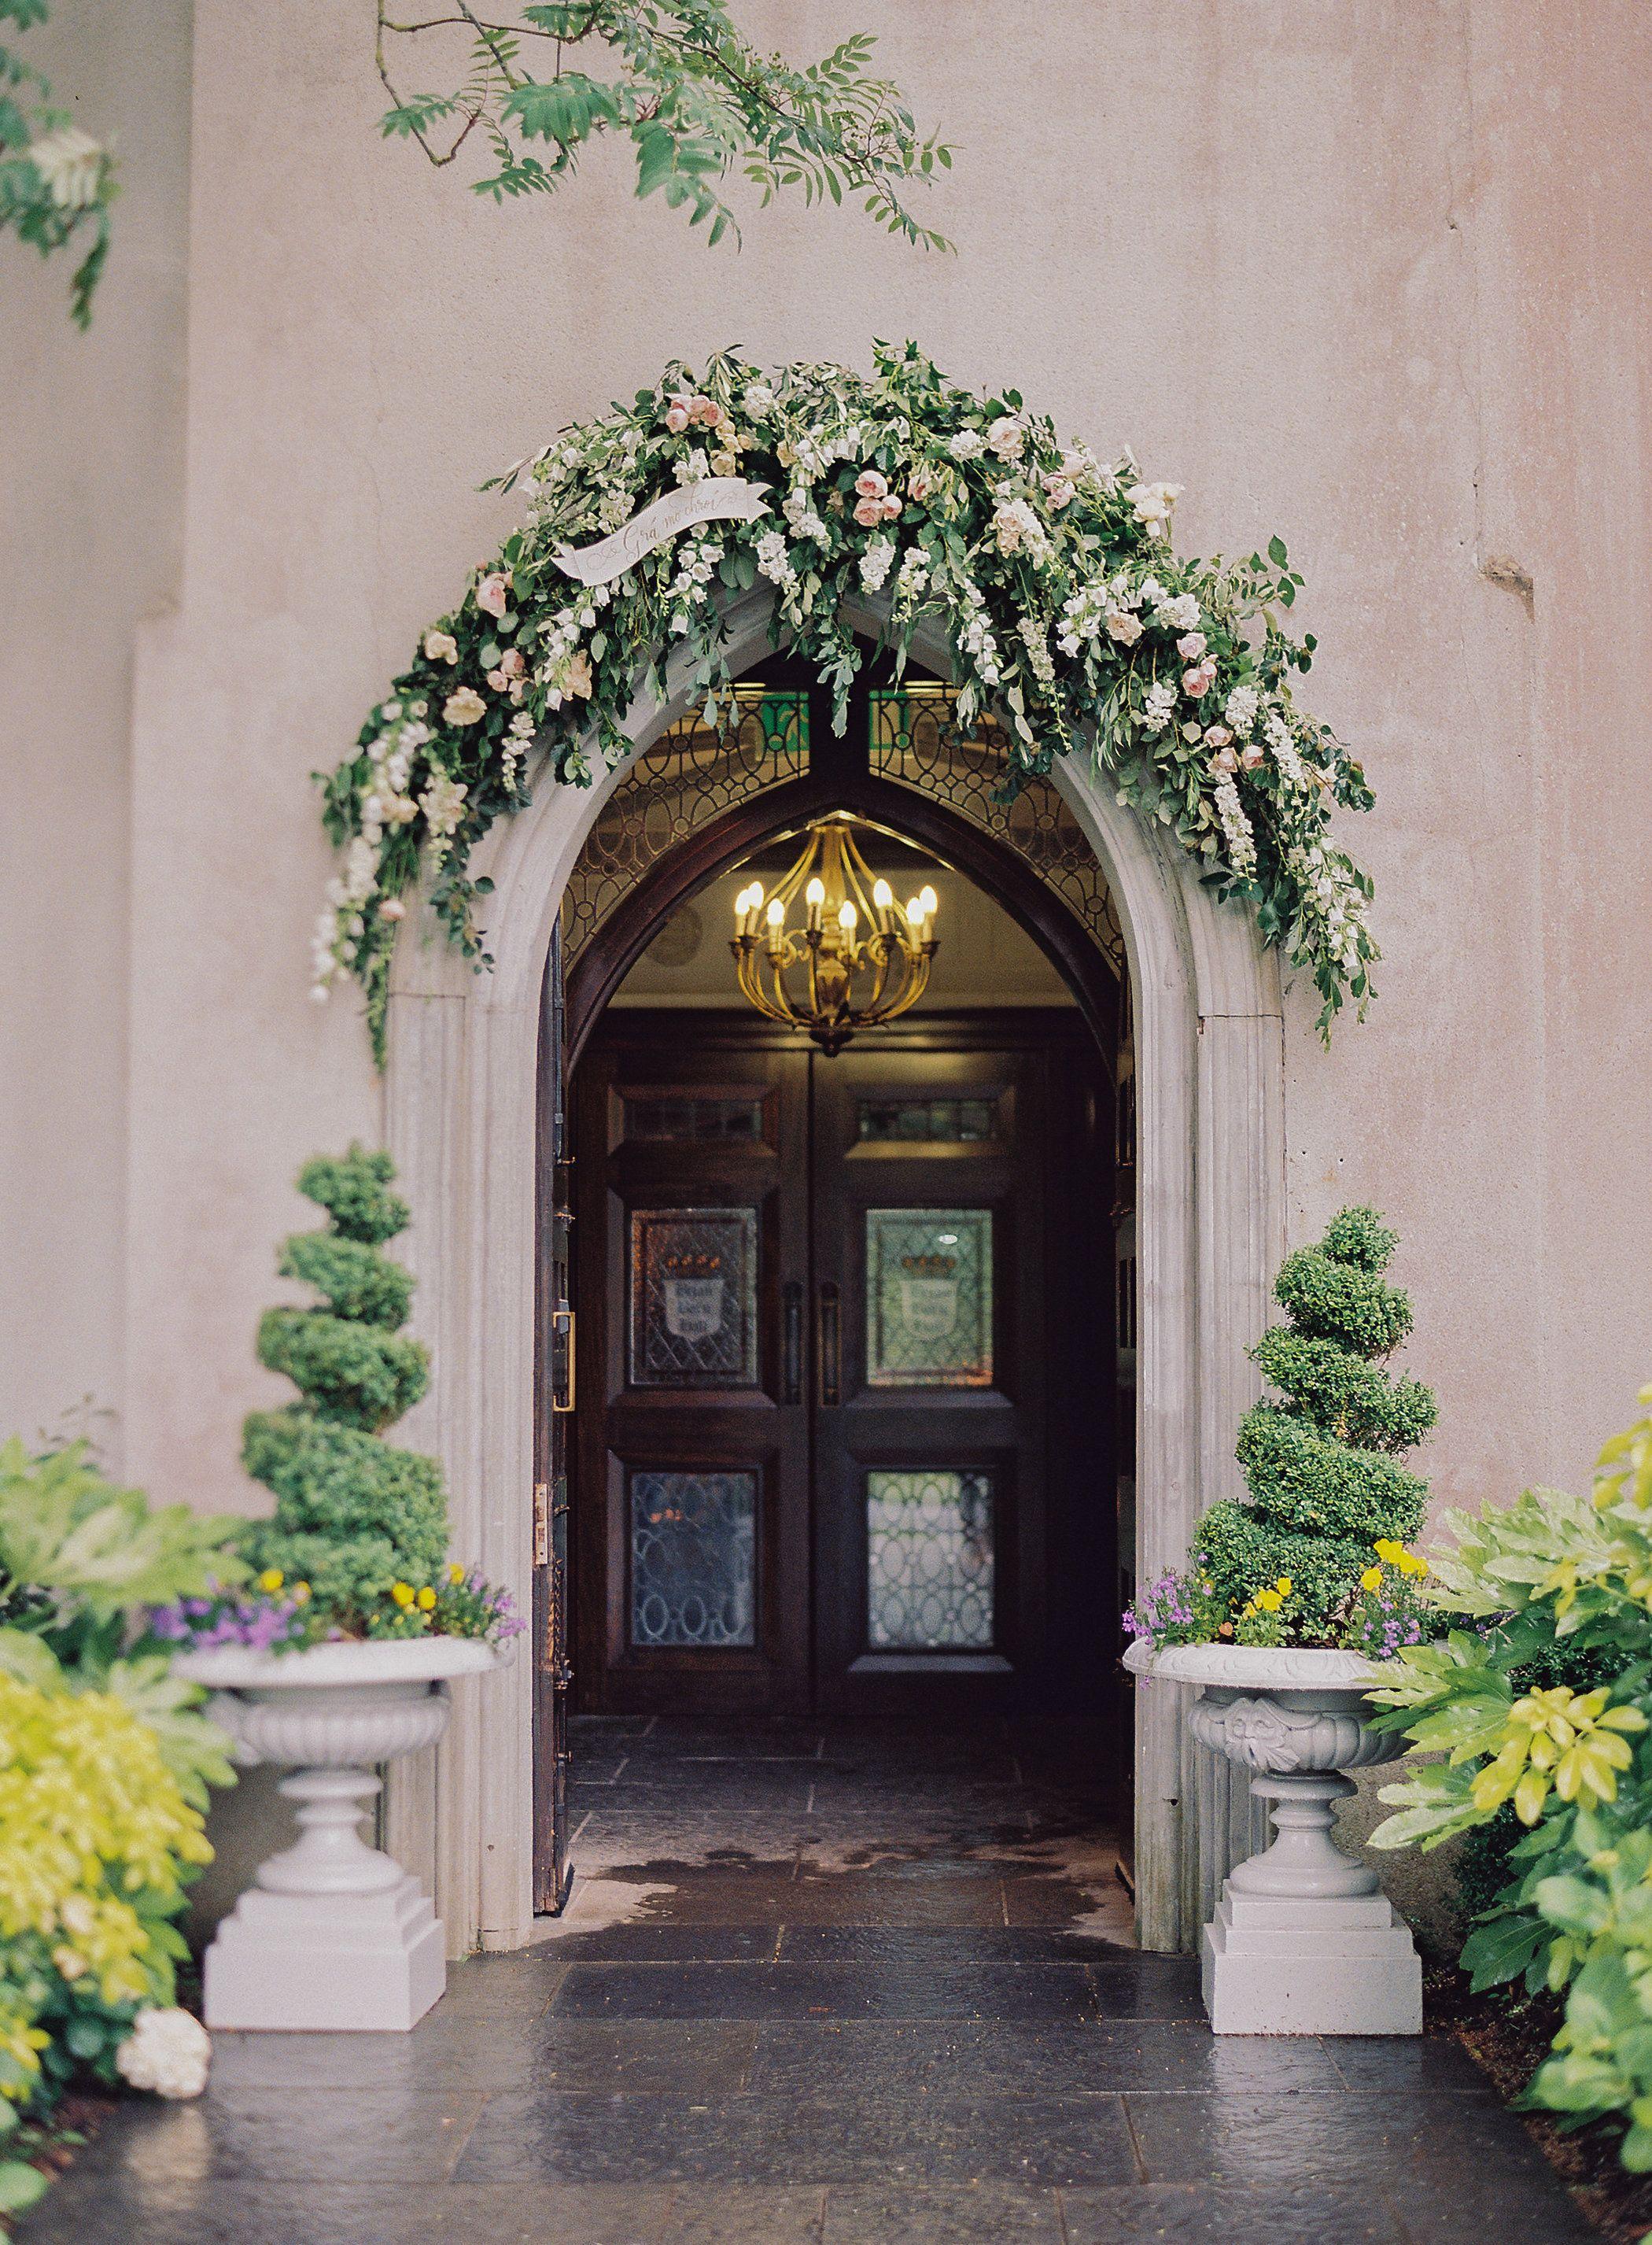 Fairytale Green and White Destination Wedding Florals